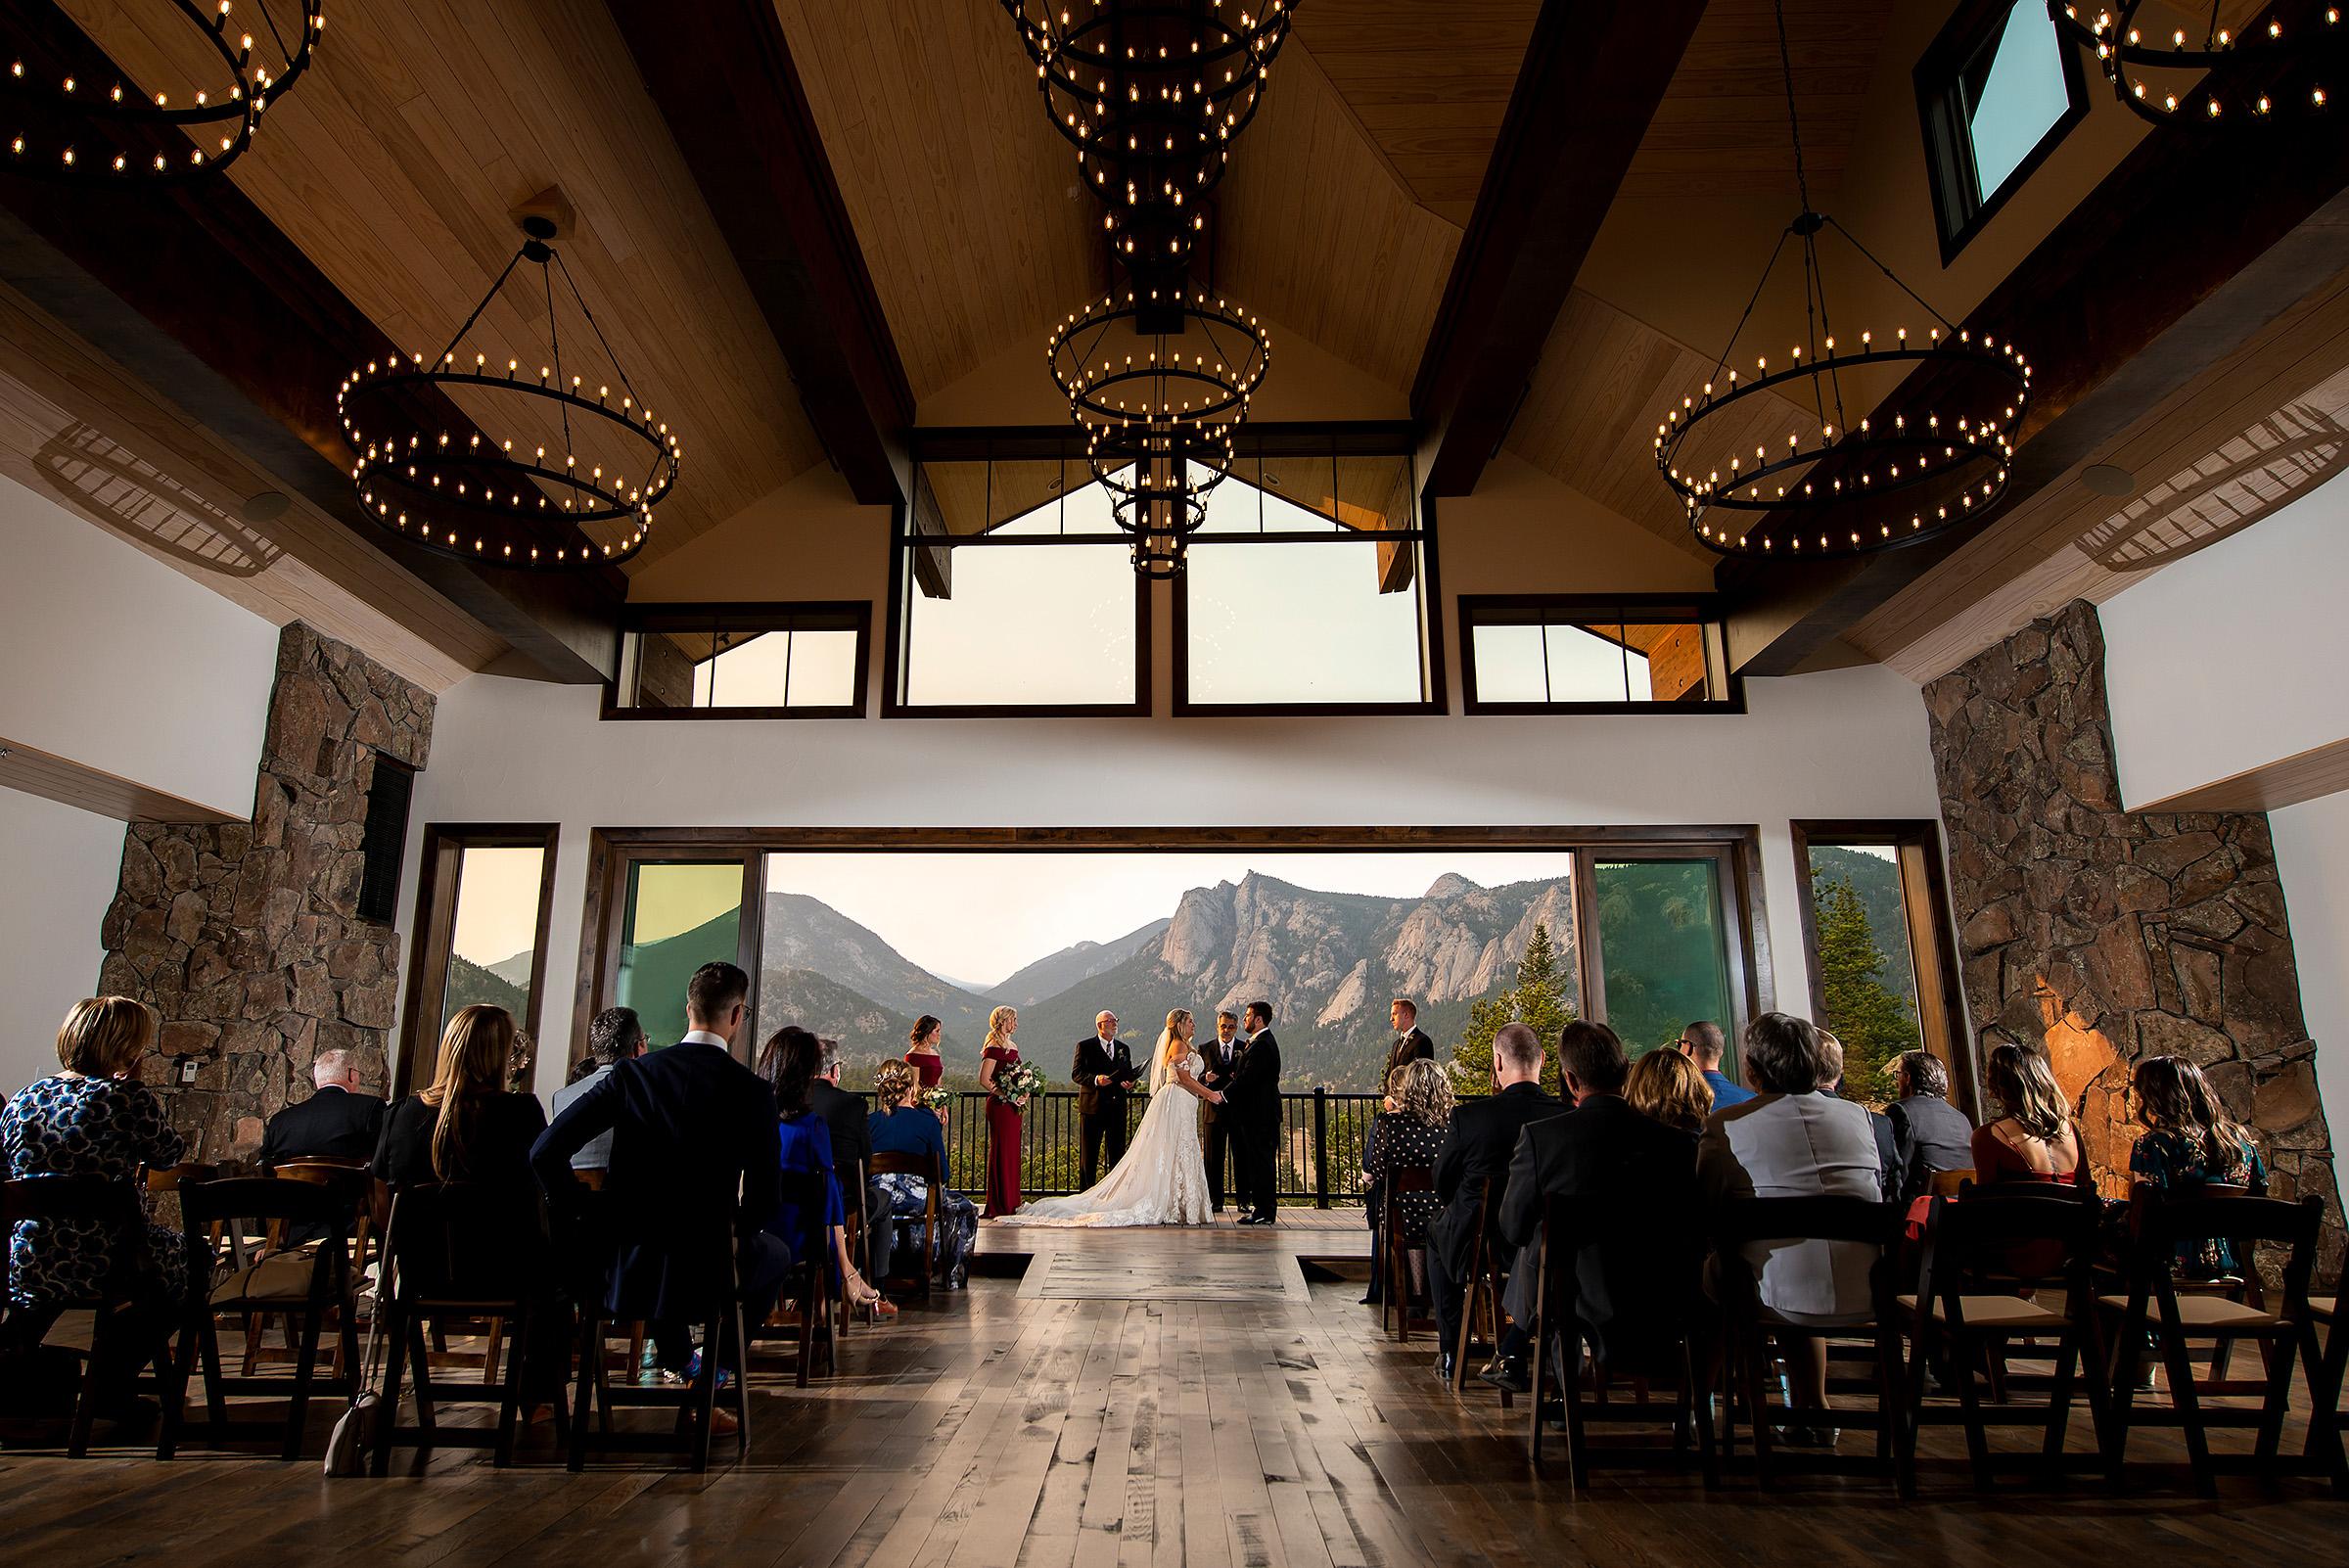 Ceremony against mountain backdrop - photo by J. La Plante Photo